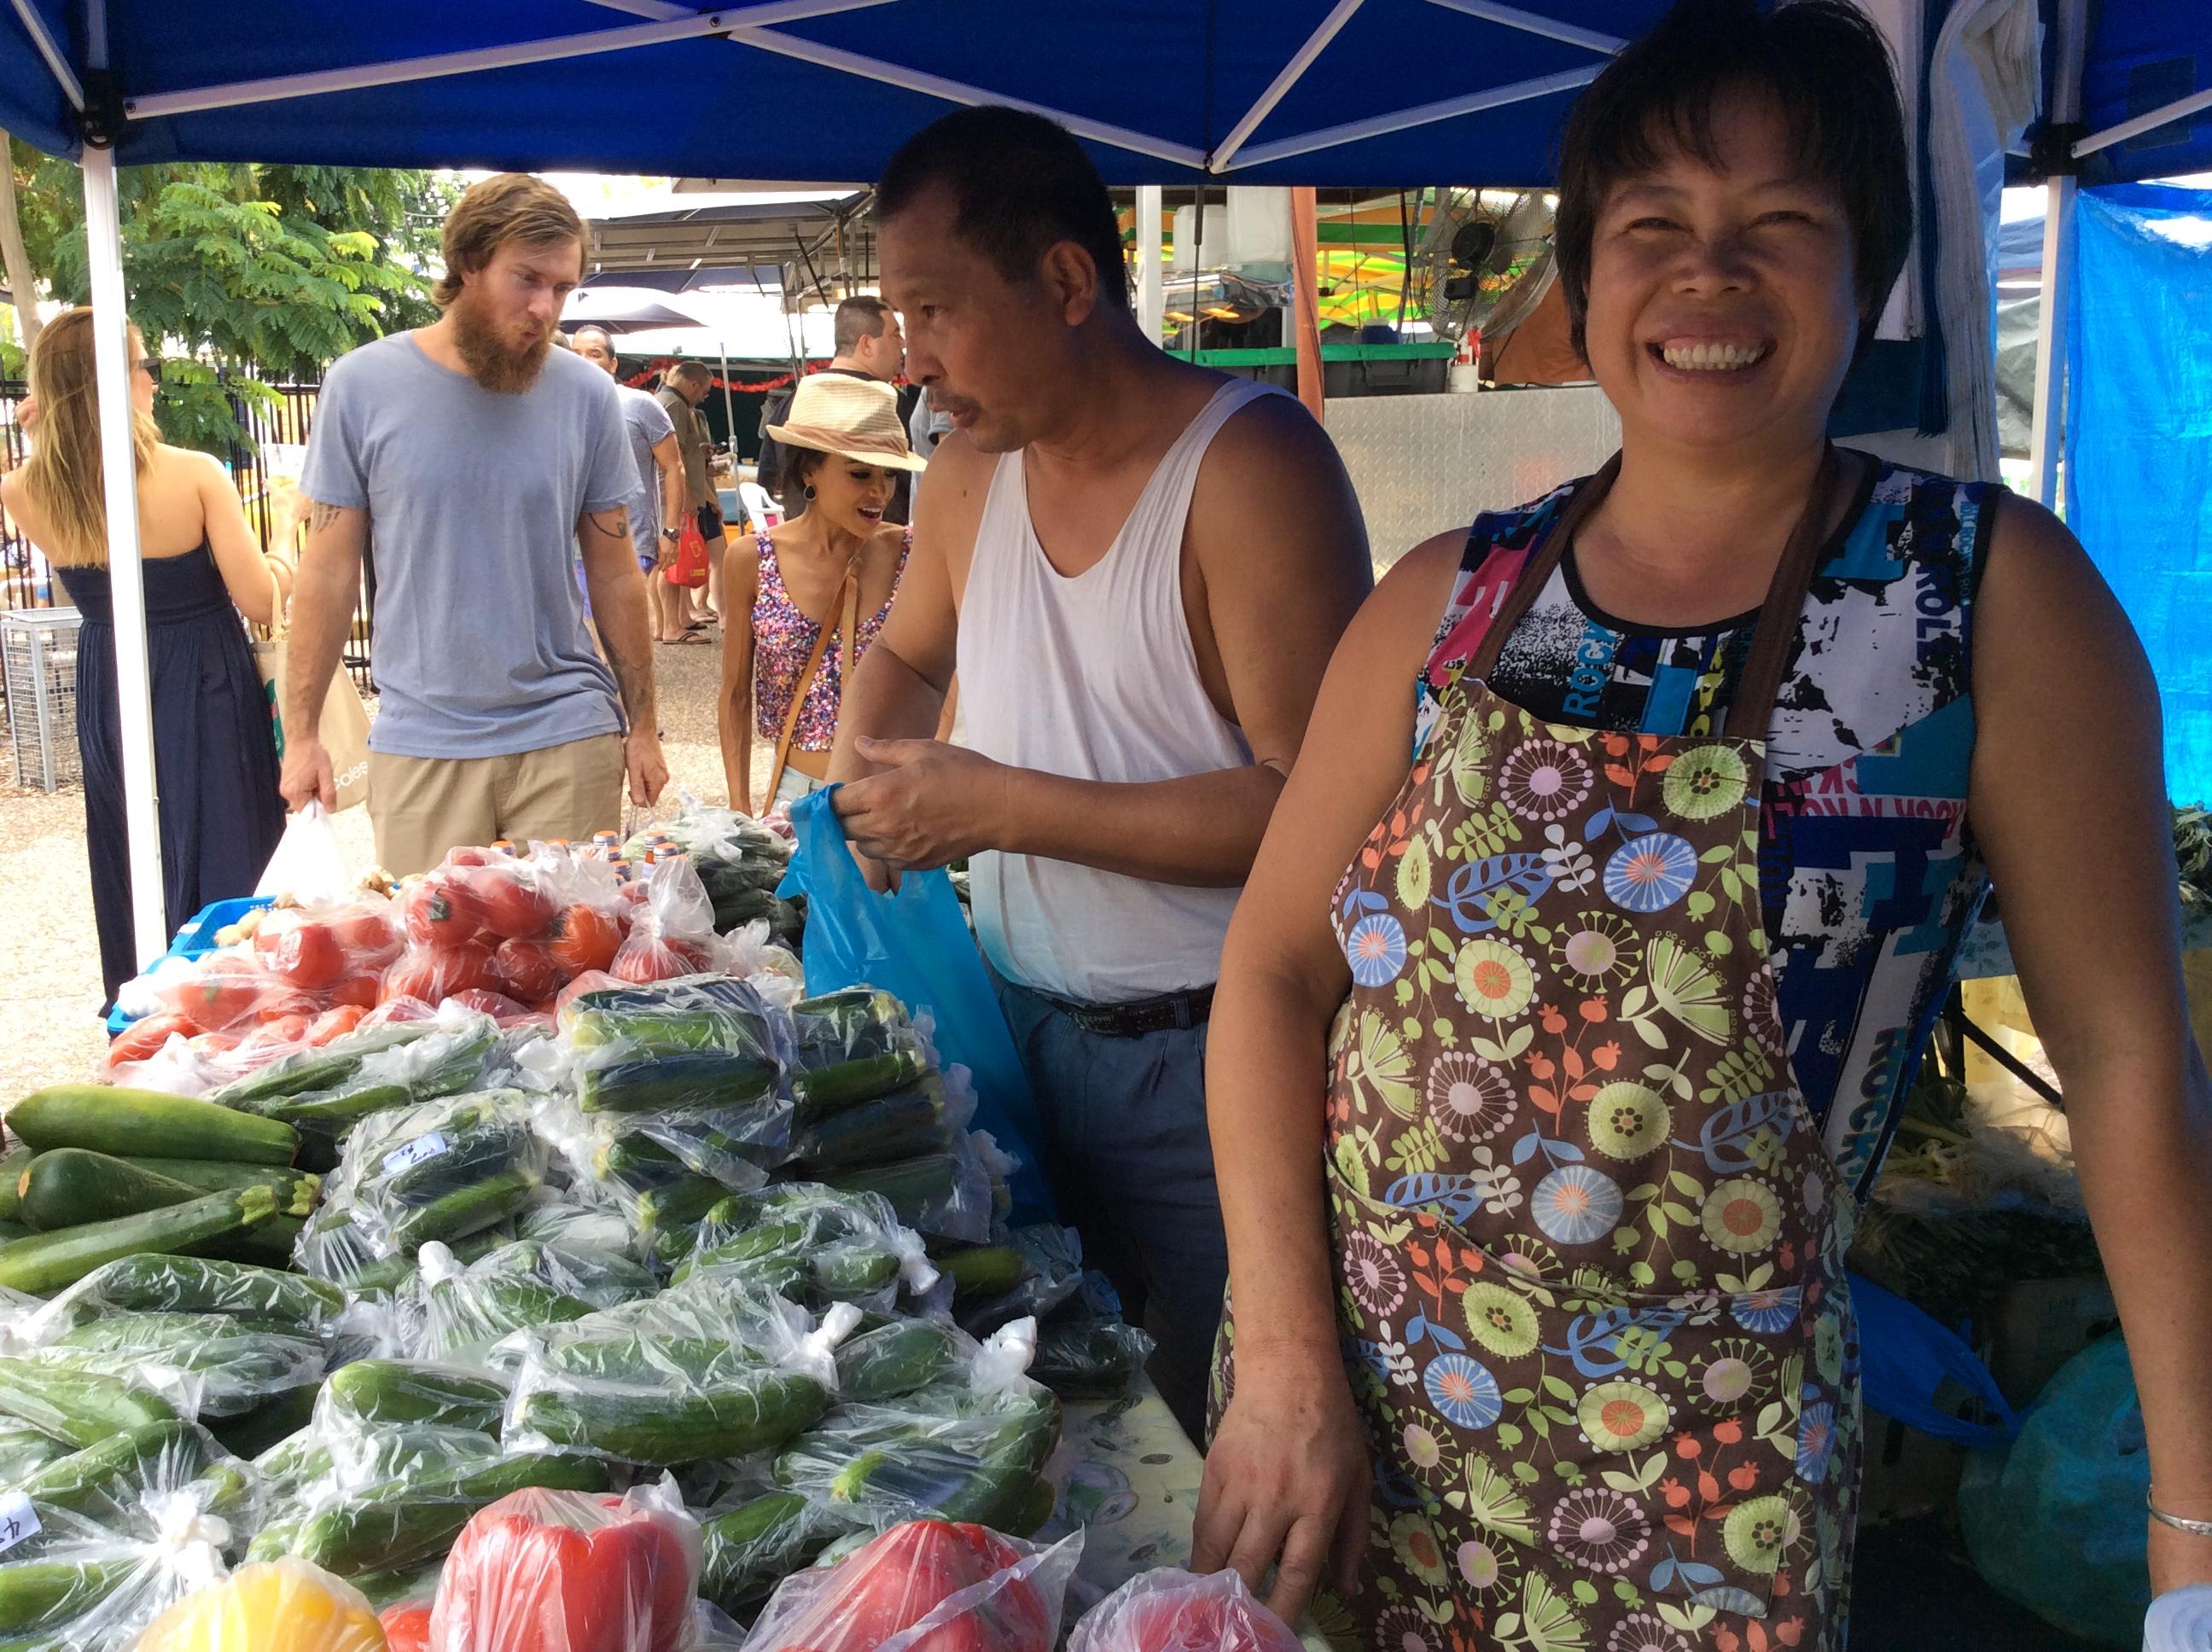 Fruit and Veg – Xing Lain Lei